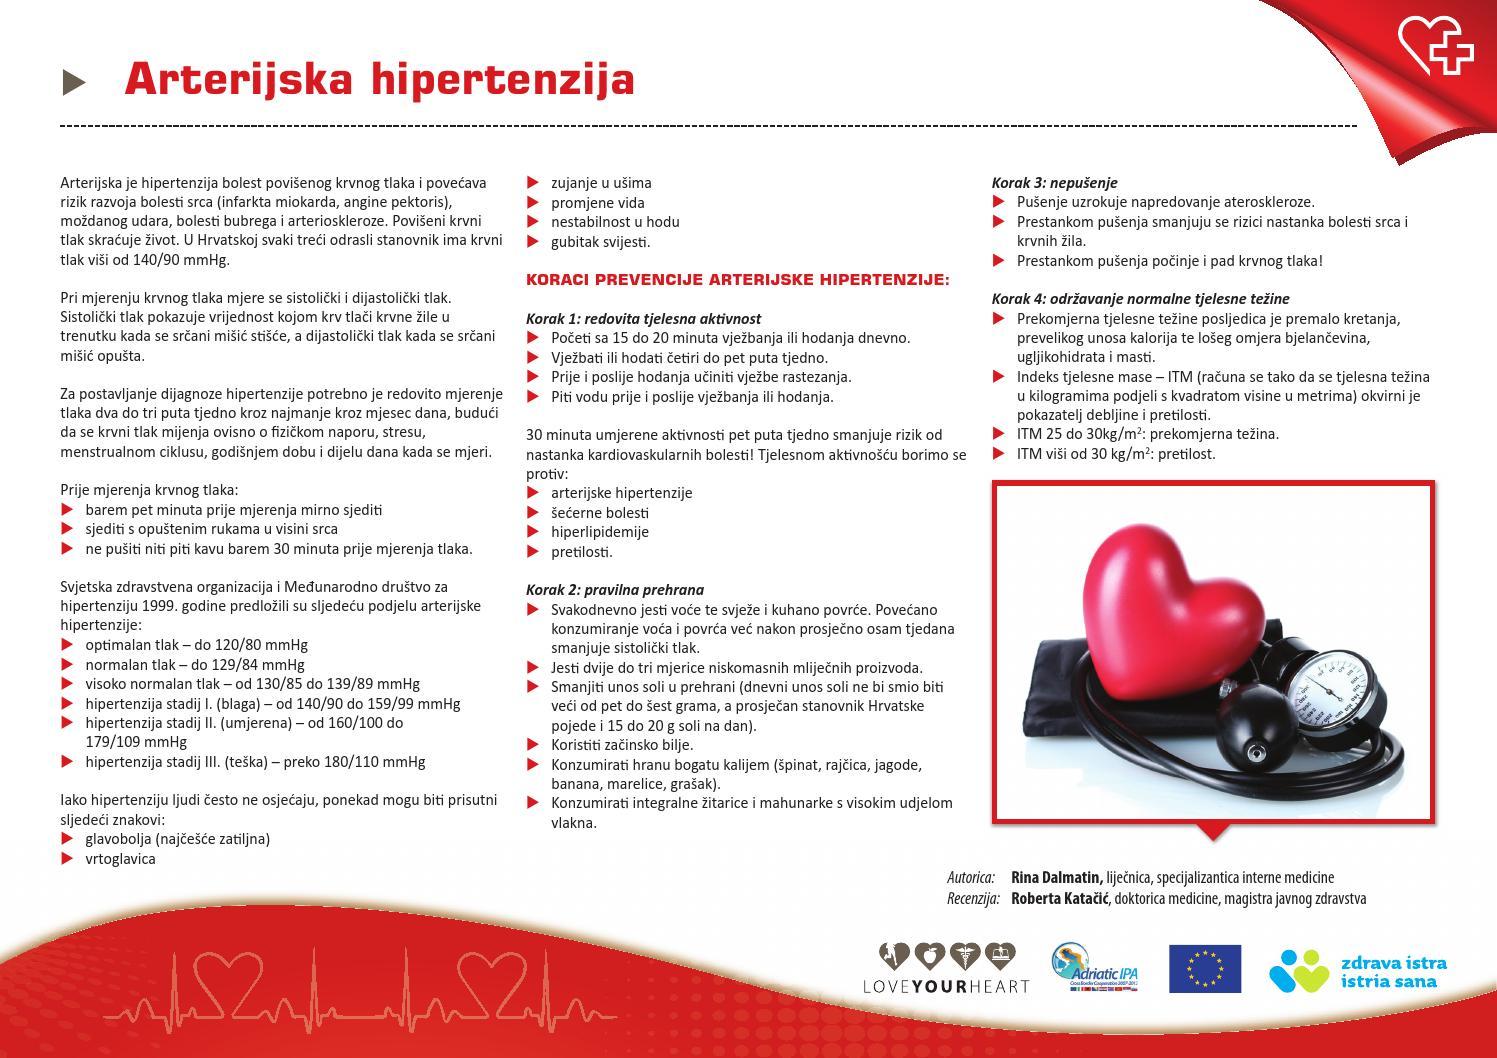 kako definirati hipertenziju ekg